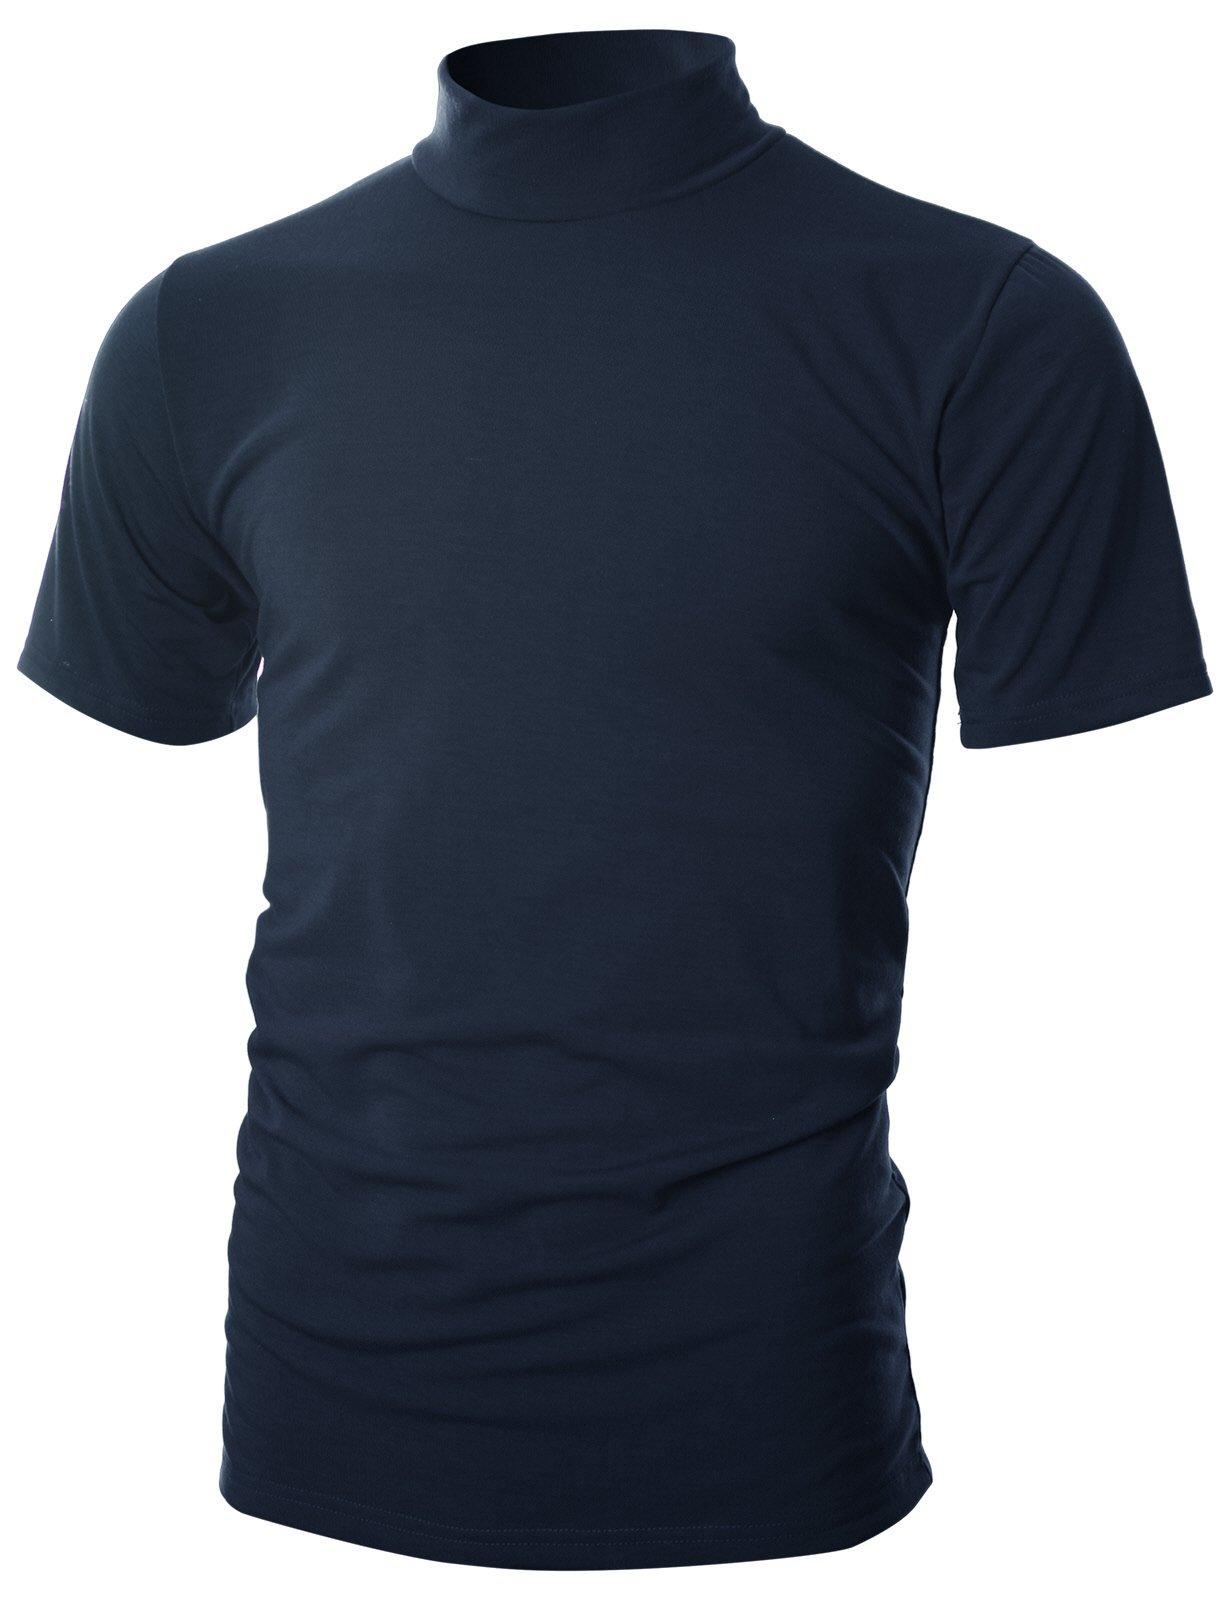 OHOO Mens Slim Fit Soft Cotton Short Sleeve Pullover Lightweight Mockneck with Warm Inside /DCT101-NAVY-S